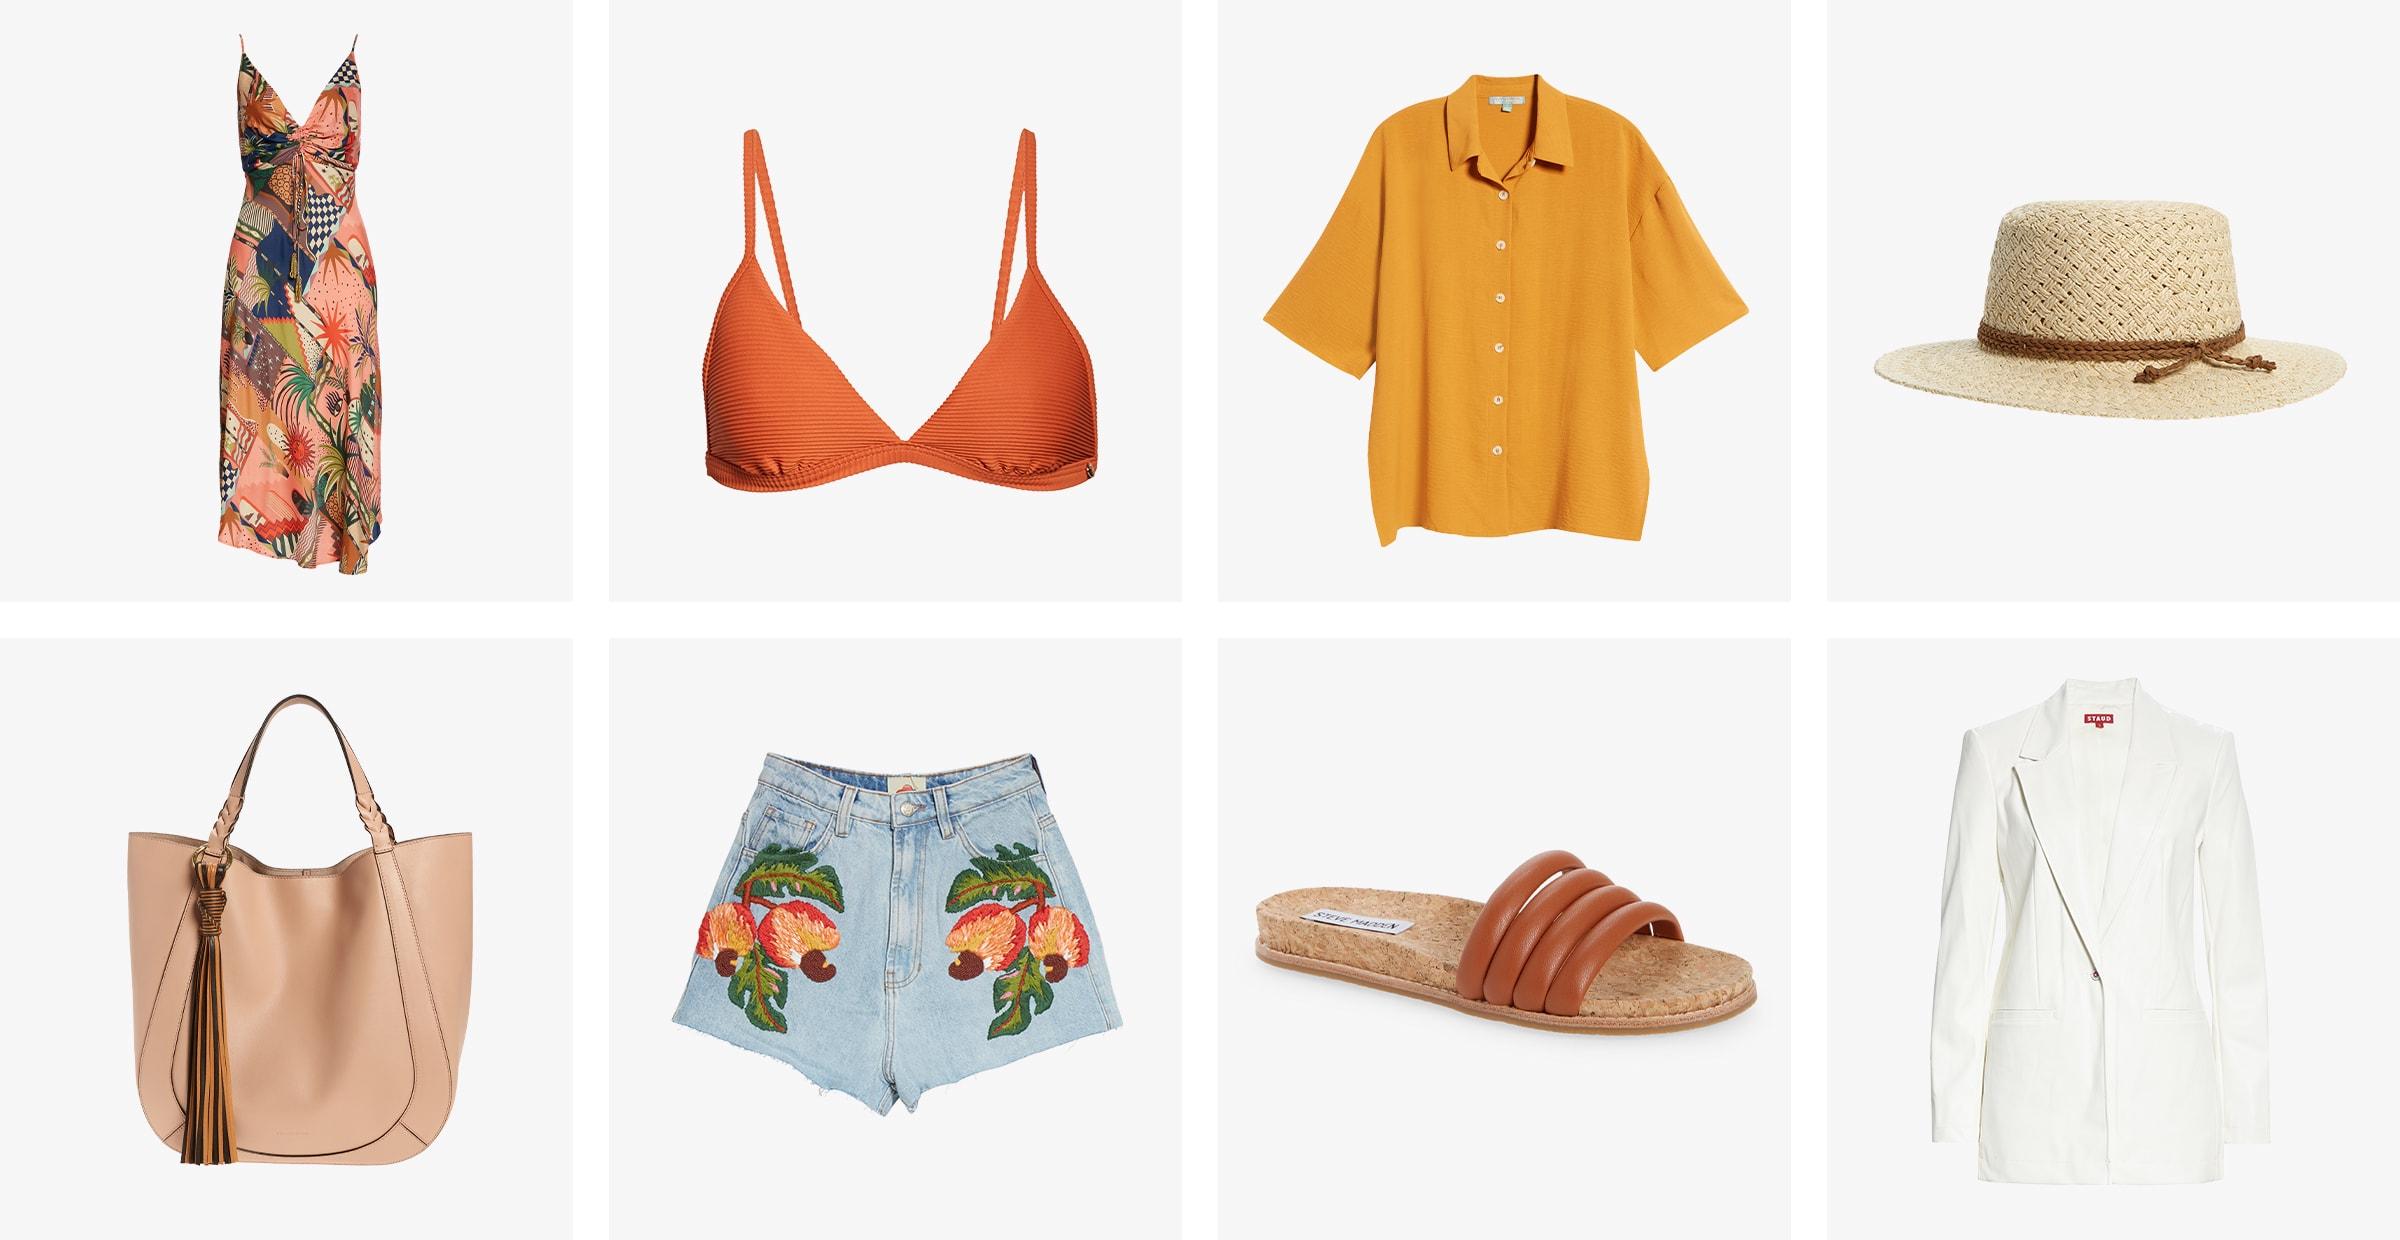 Printed dress, orange bikini top, button-up, straw hat, handbag, denim shorts, sandals and white blazer.